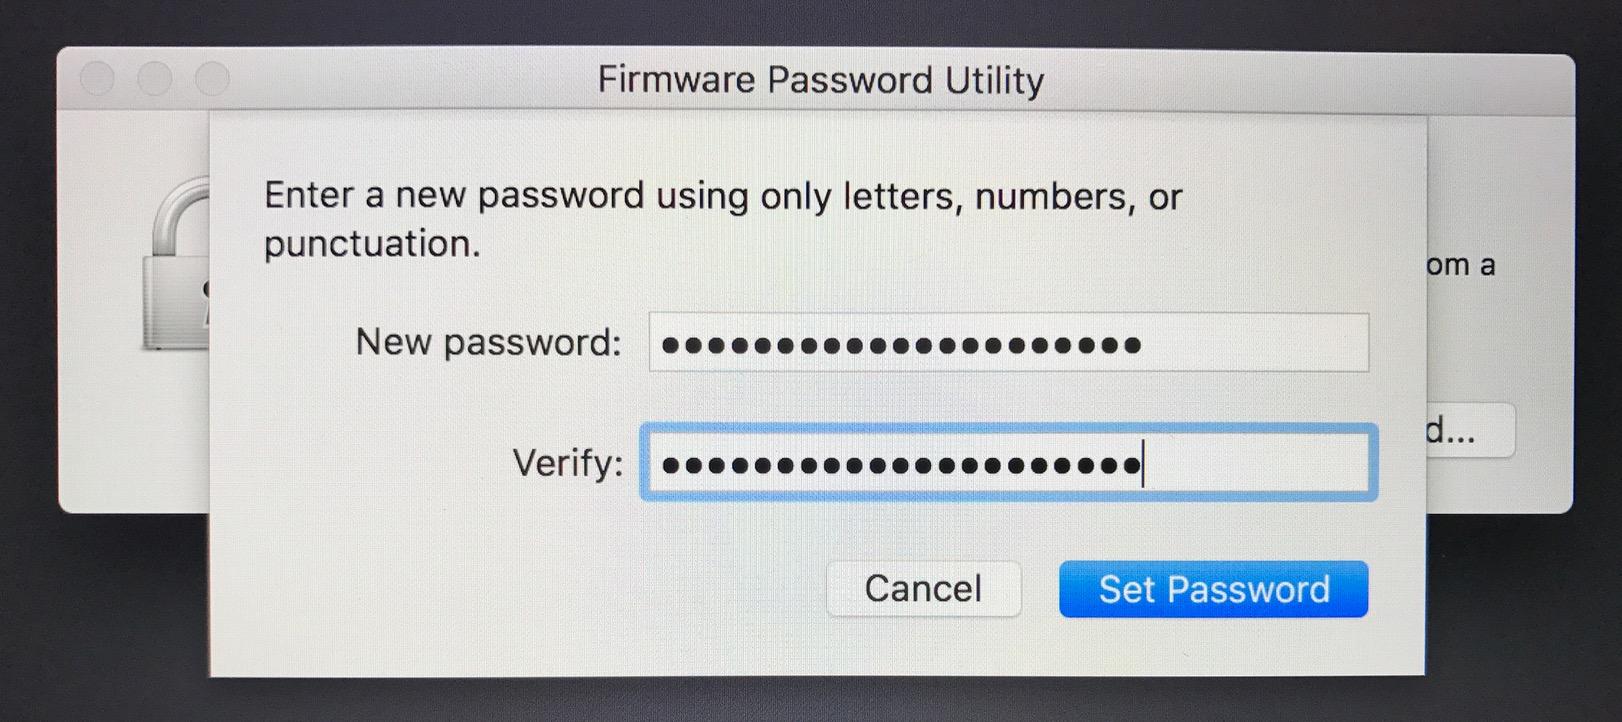 The Mac Firmware Password UtilityEnter Password makes you enter a new password